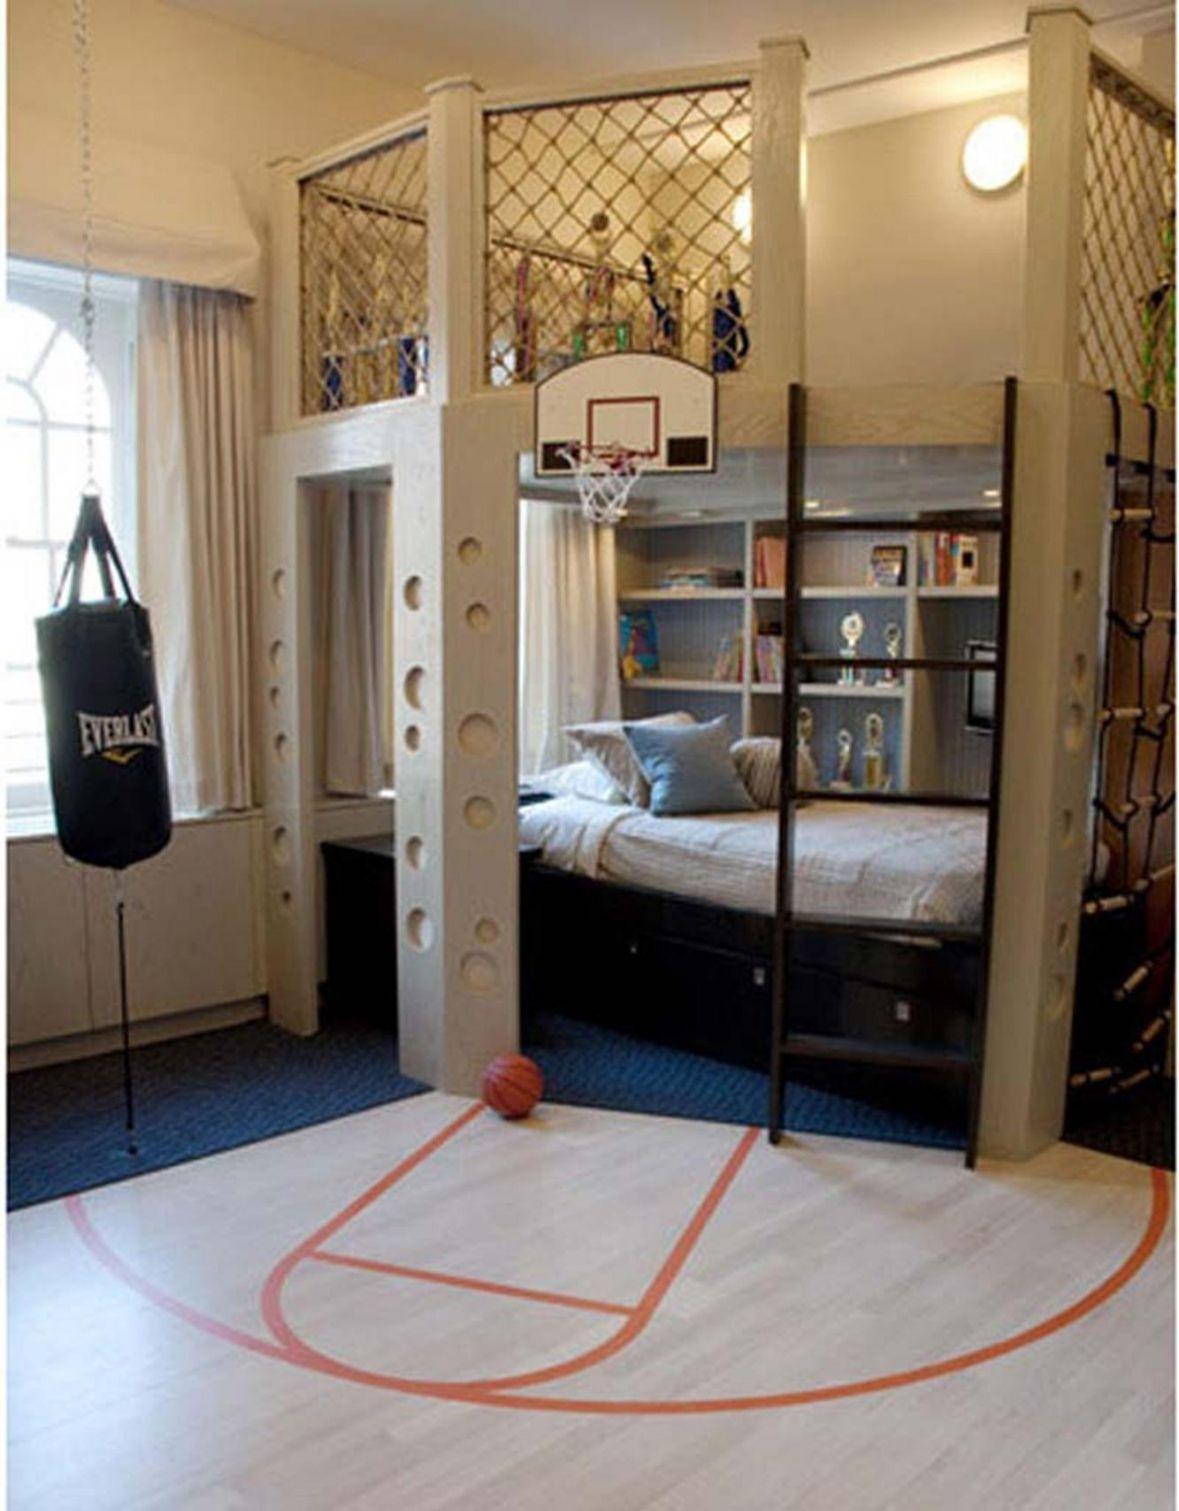 cool kids bunk beds interior paint colors 2017 check more at http rh pinterest com au cool kids rooms boys cool kids rooms boys